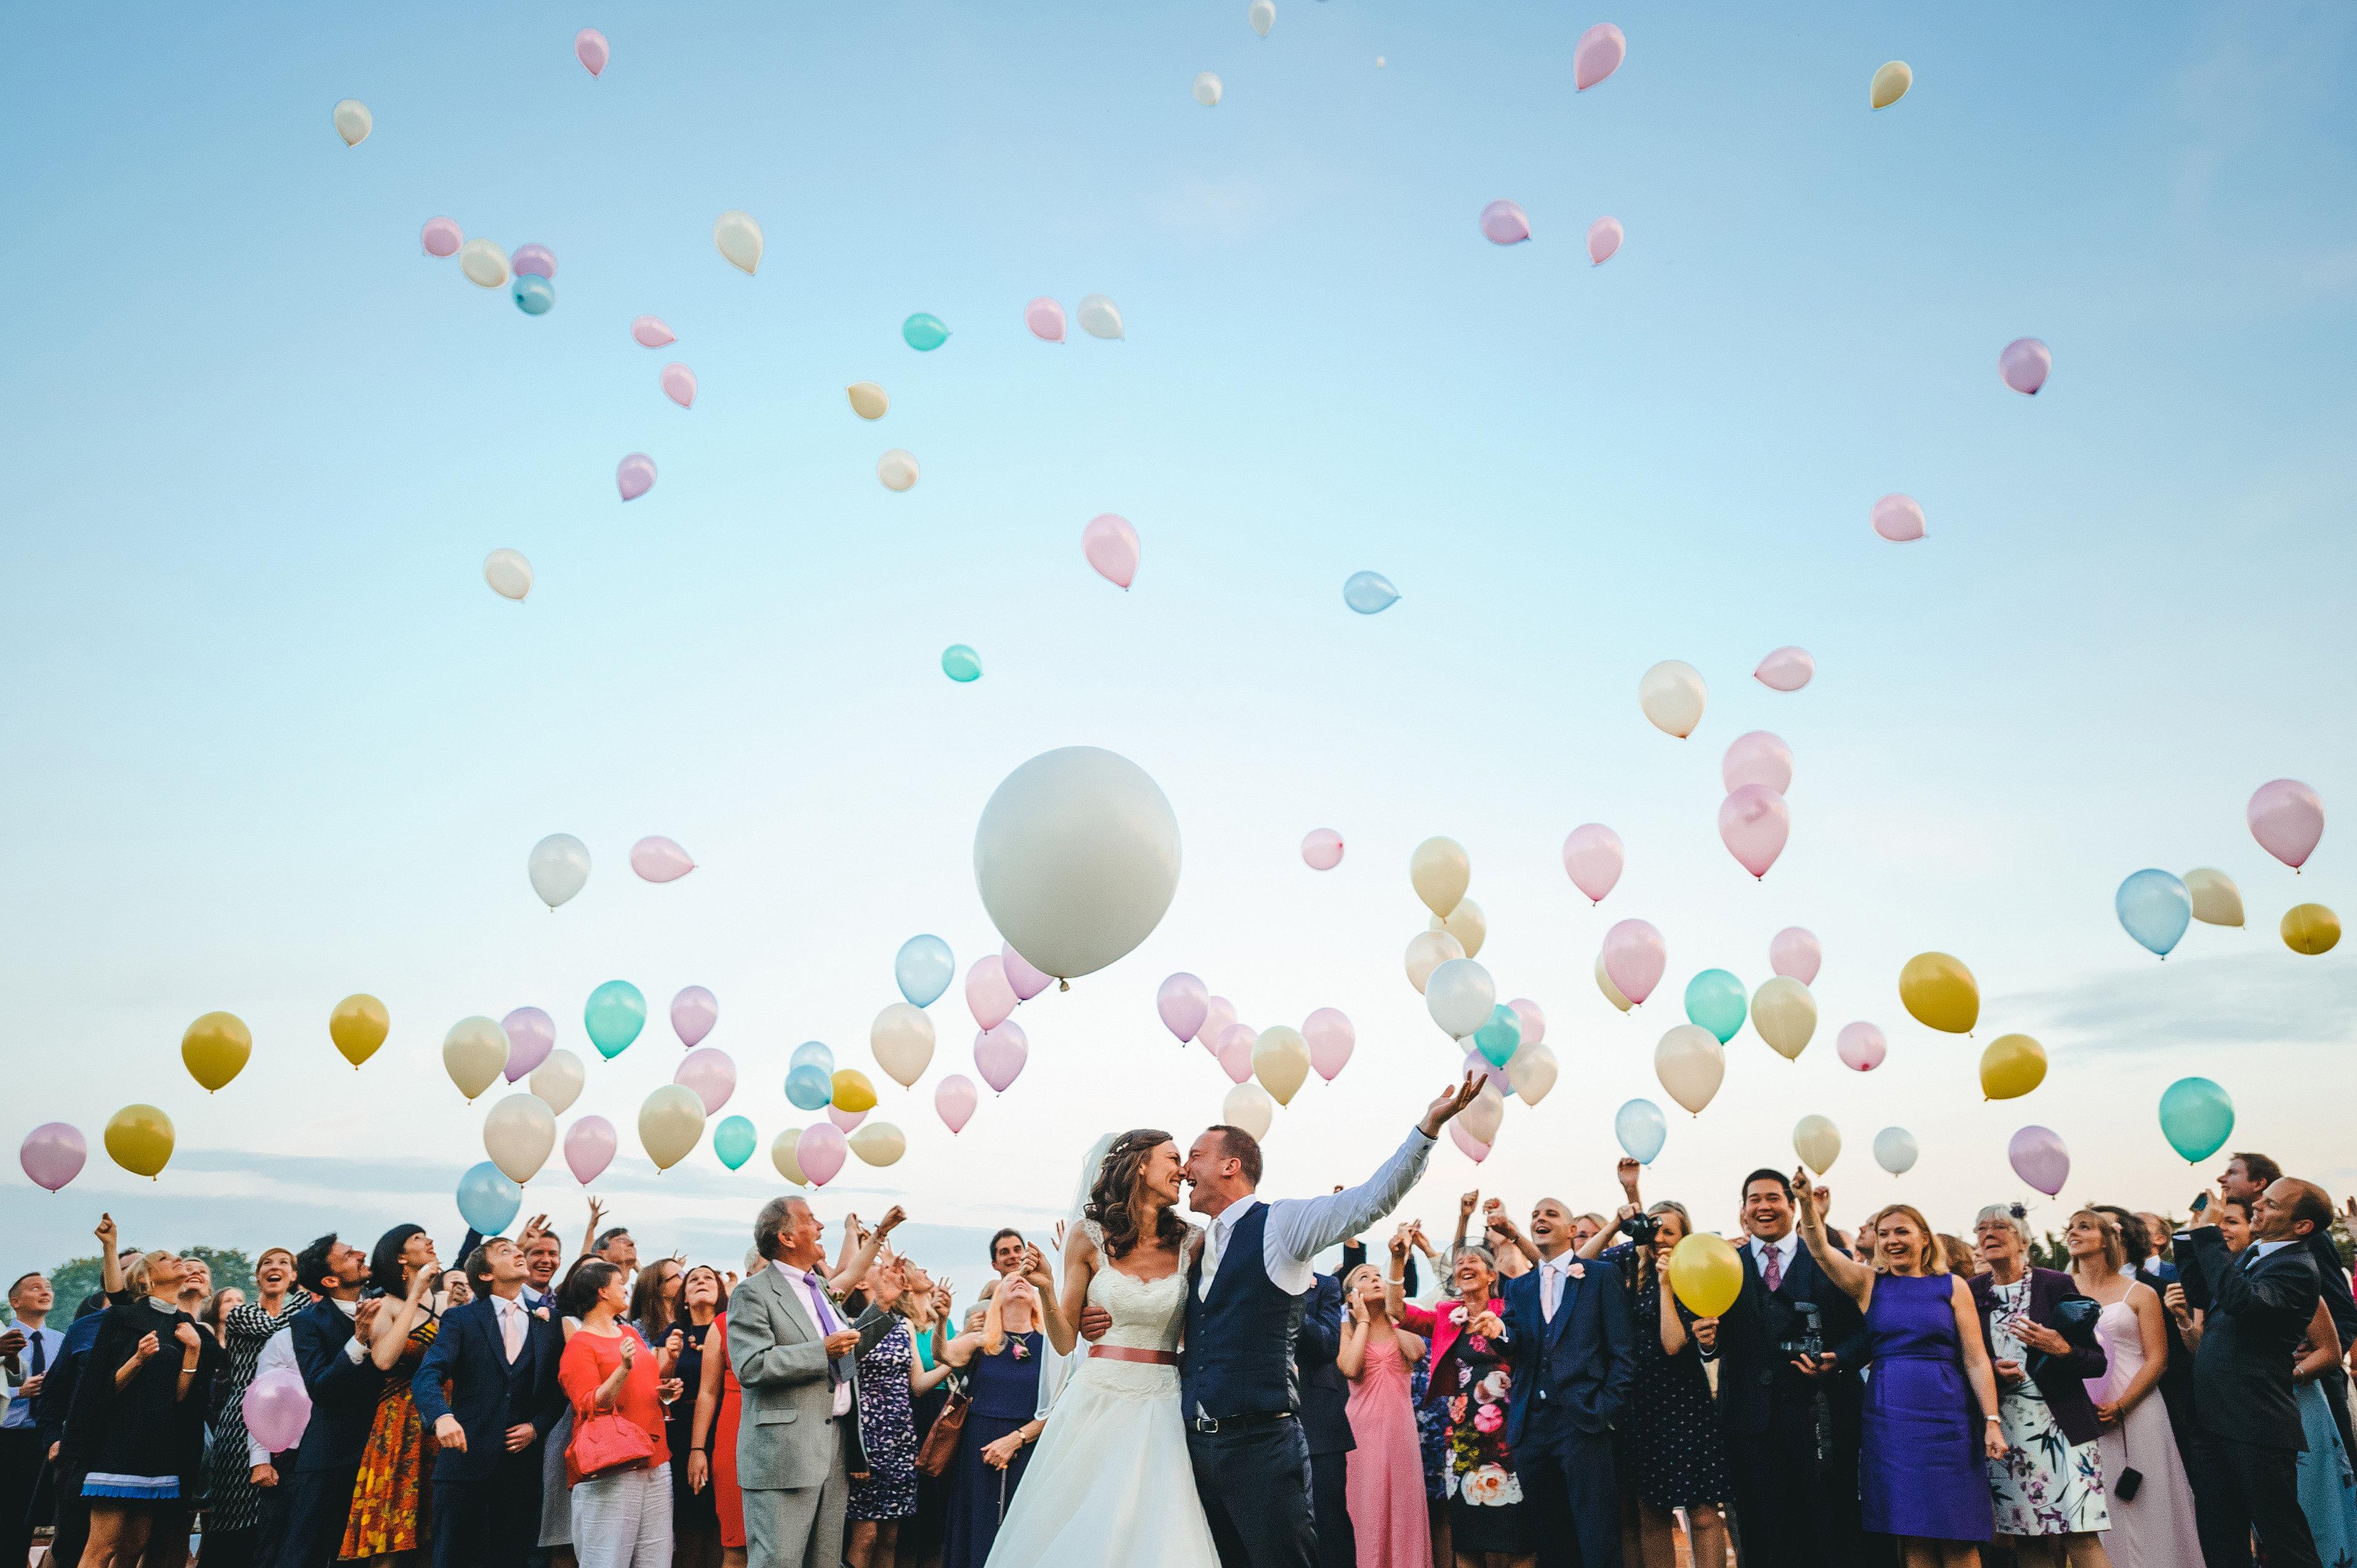 Helen & Andrew 17 designer wedding dresses by Caroline Castigliano